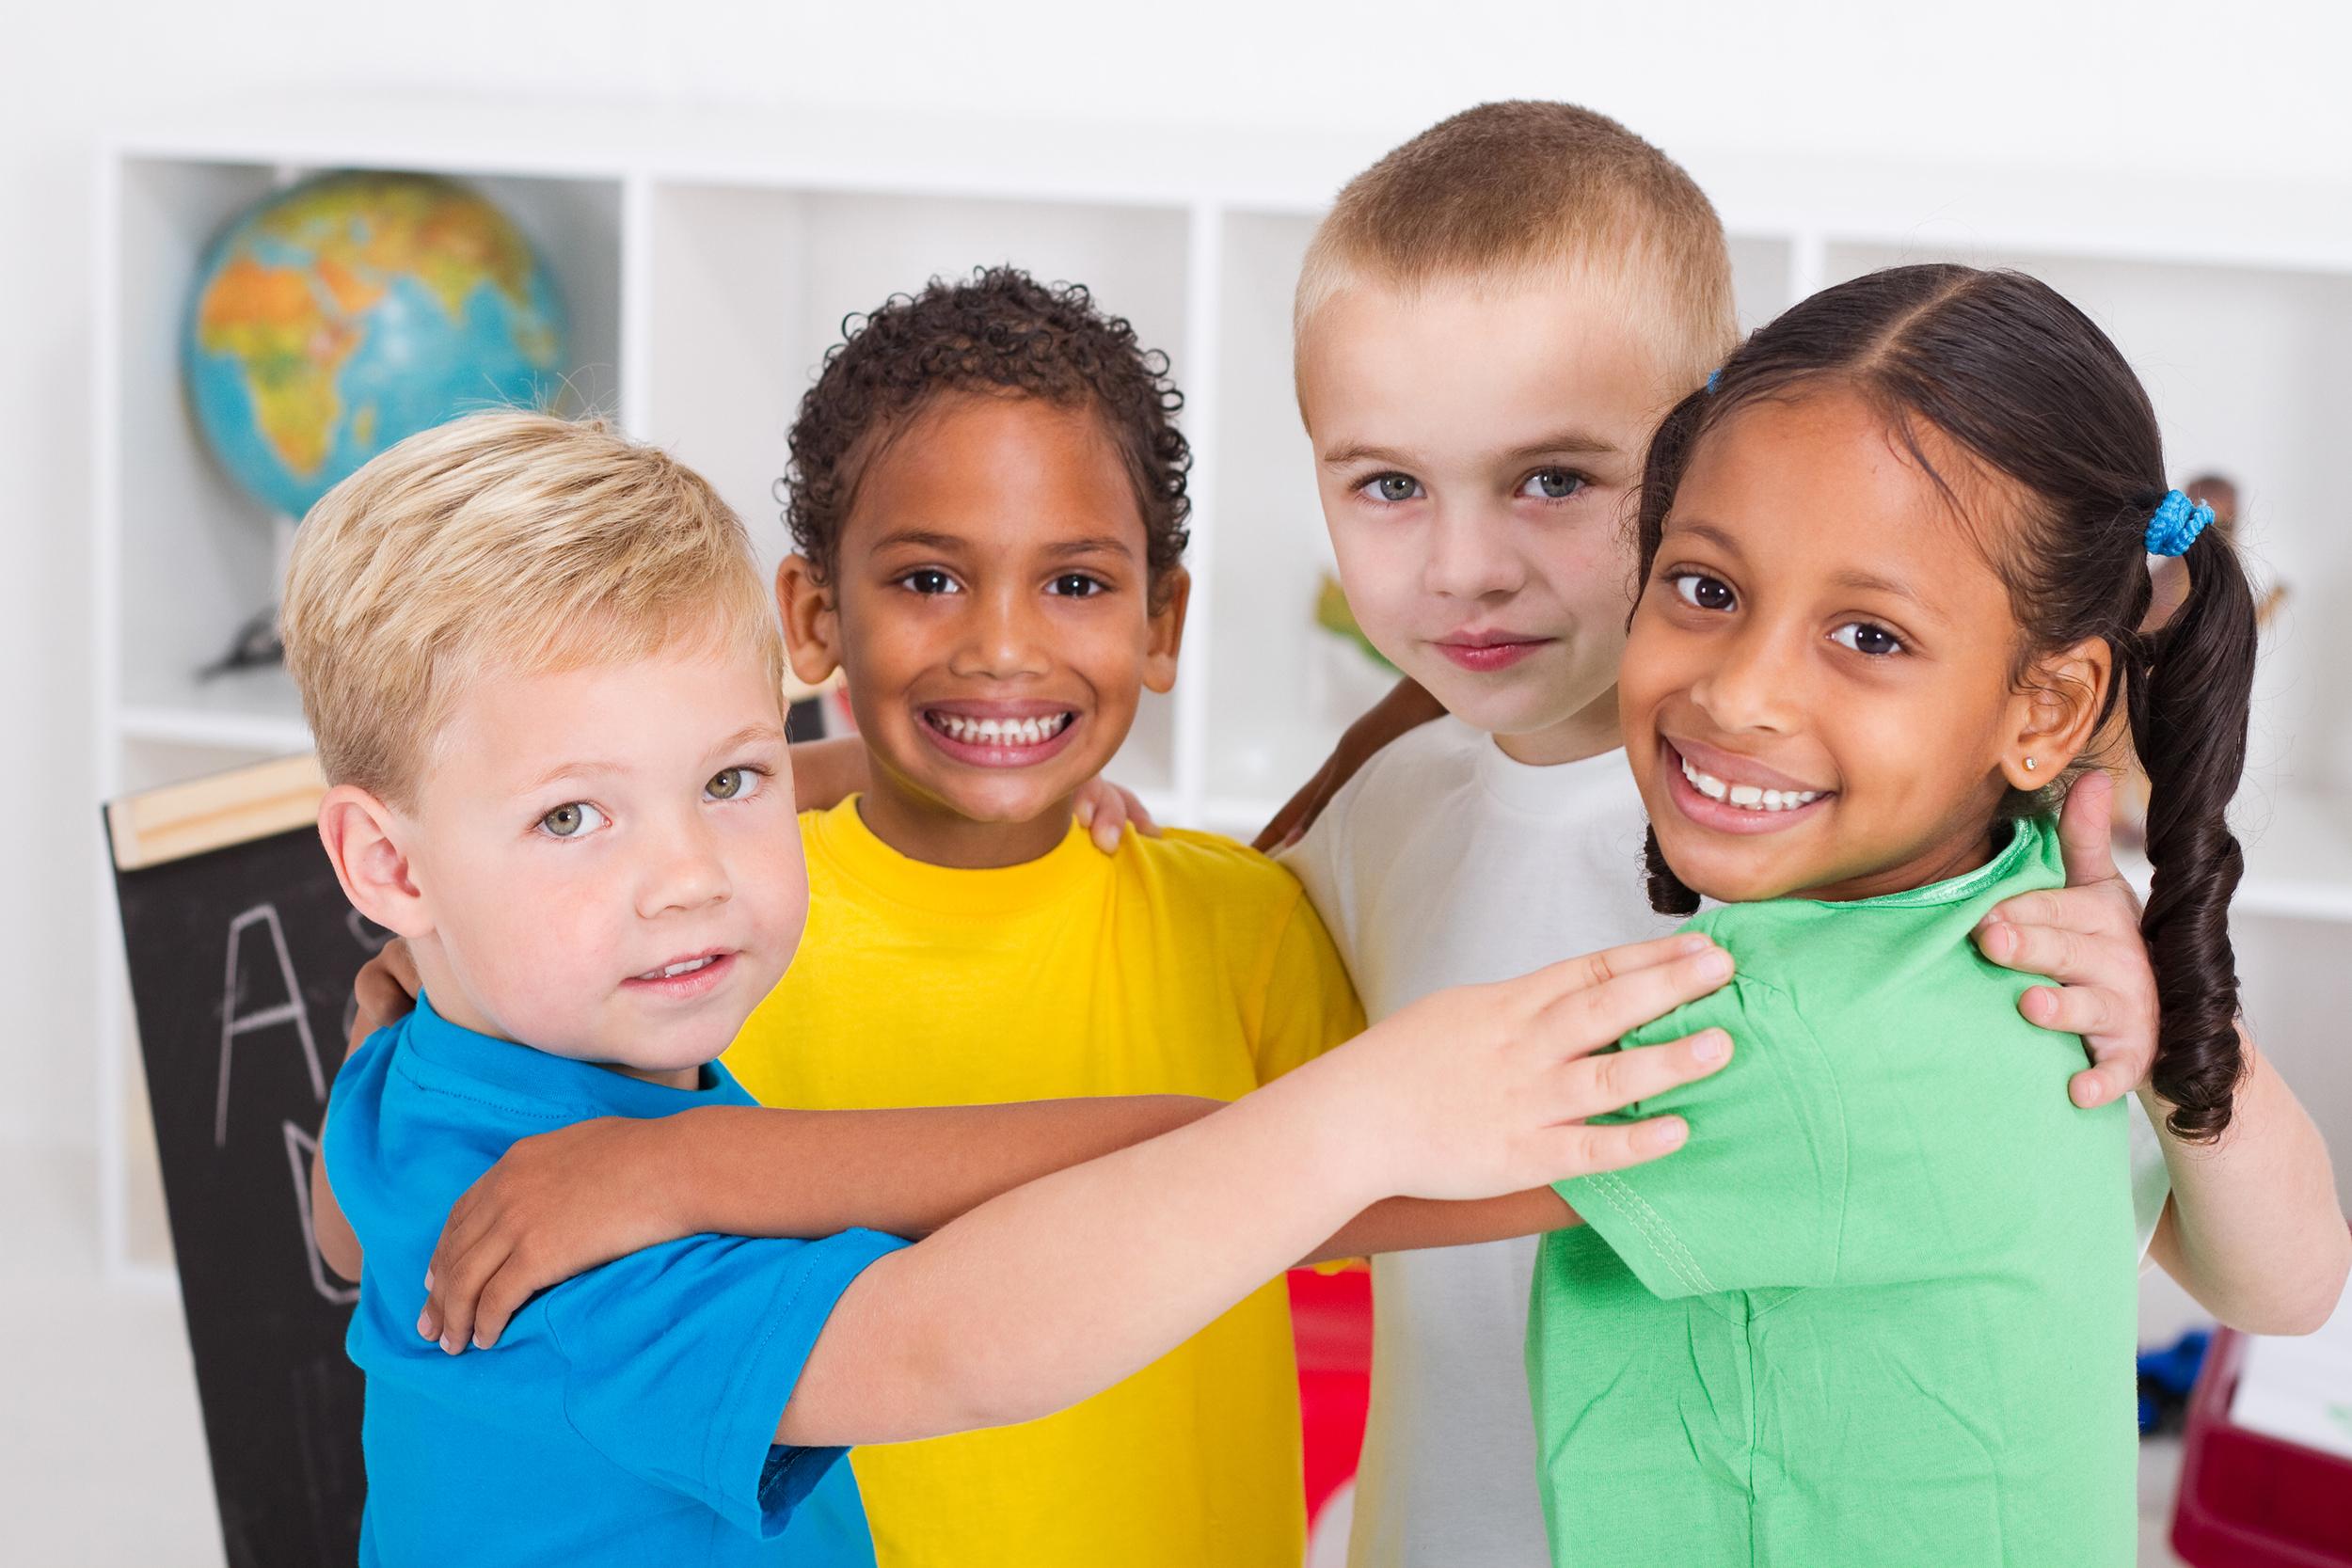 Children at Progressive Church, as part of Children's Ministry